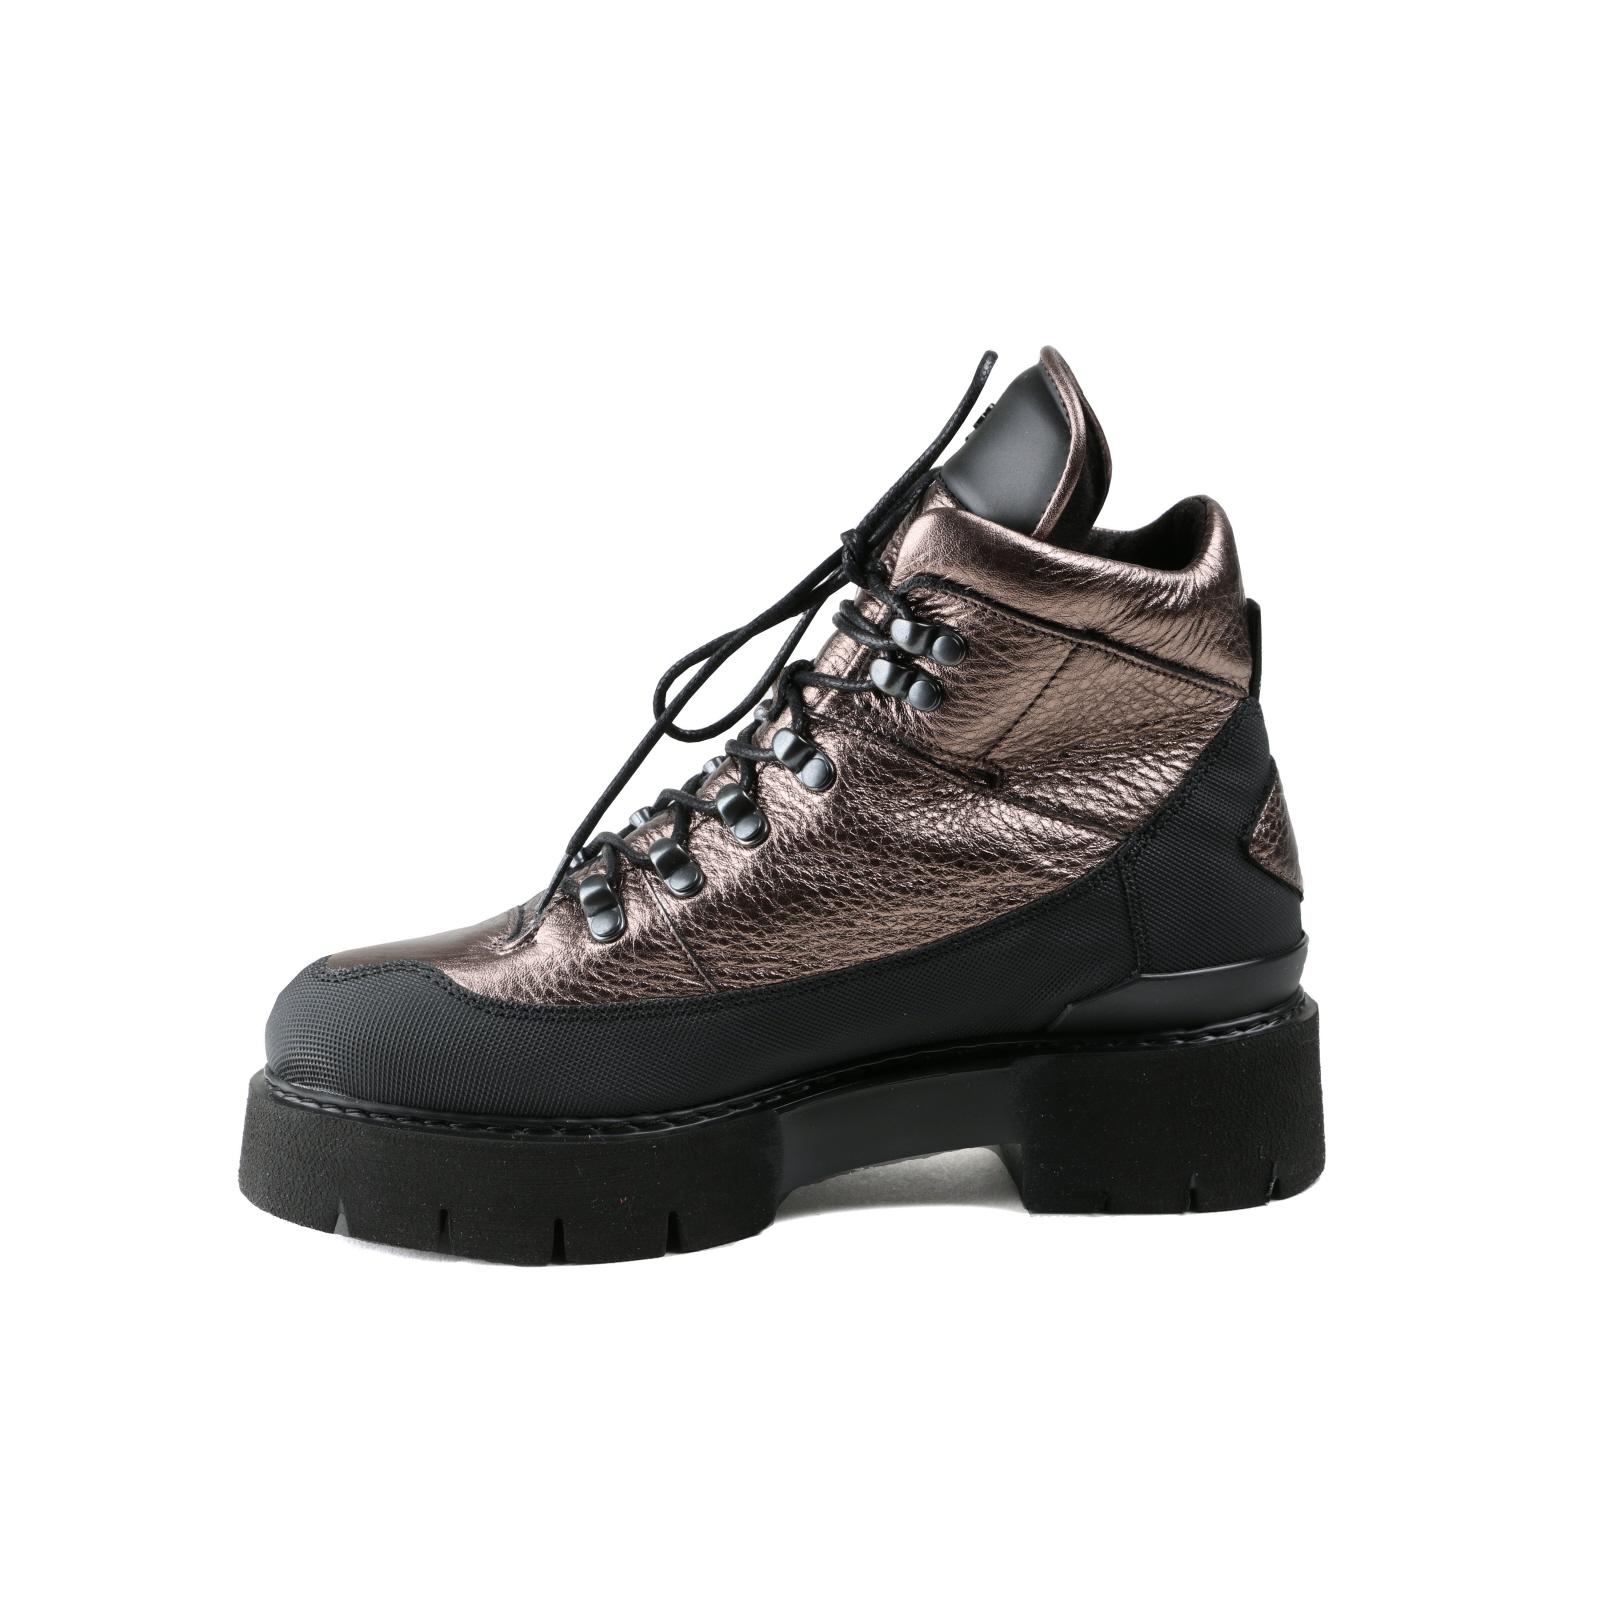 Oxs Damen Bronze Neu Glattleder Stiefel 37 Gr Lässig 6xxw8f5A